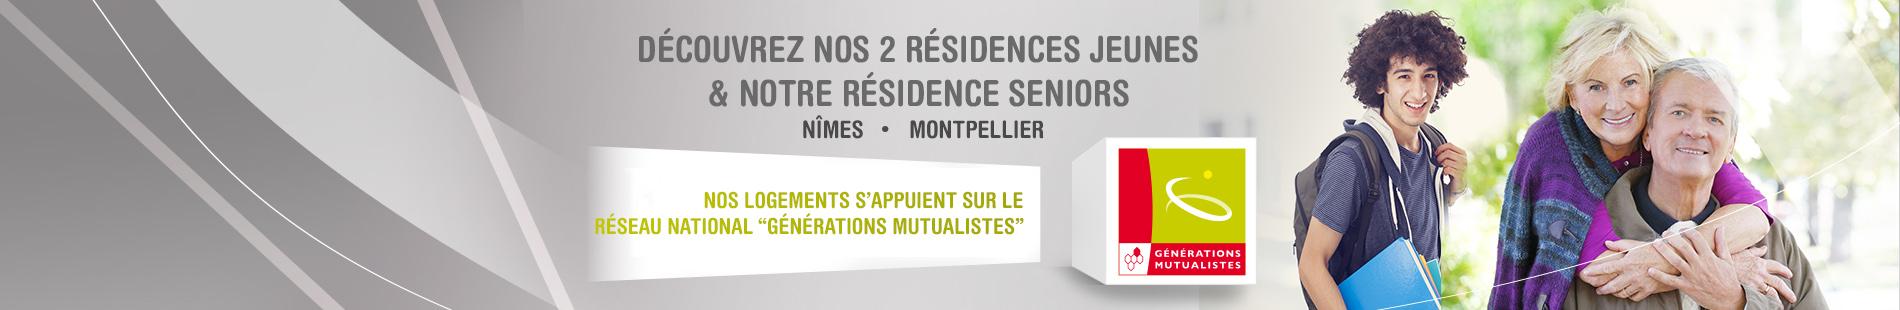 MFGS - Logement mutualiste